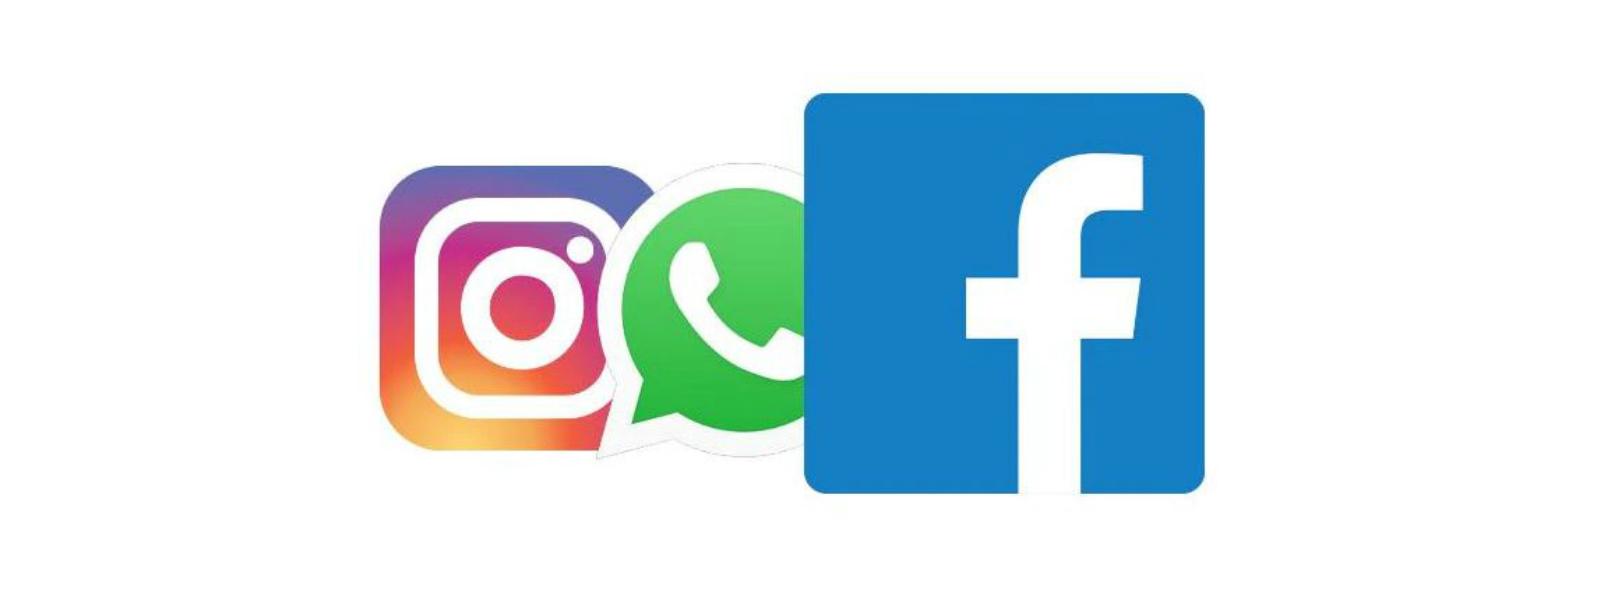 Facebook, WhatsApp යළි යථා තත්ත්වයට